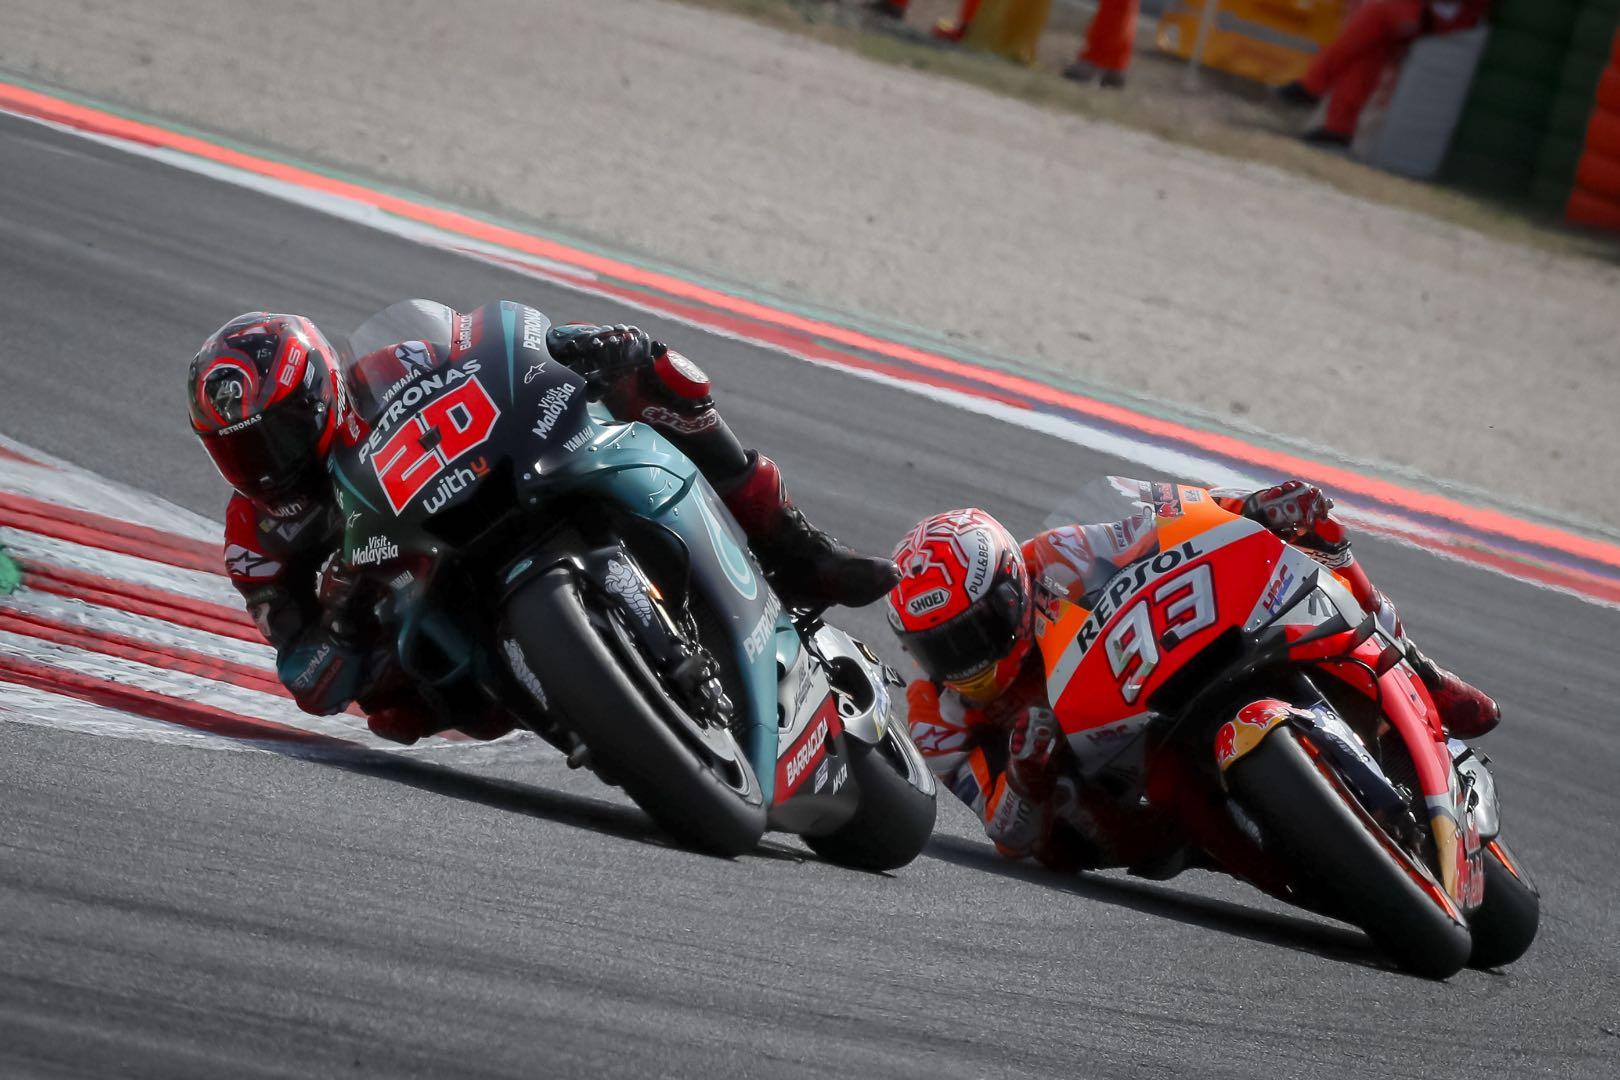 2019 San Marino MotoGP Results from Misano (Updated)